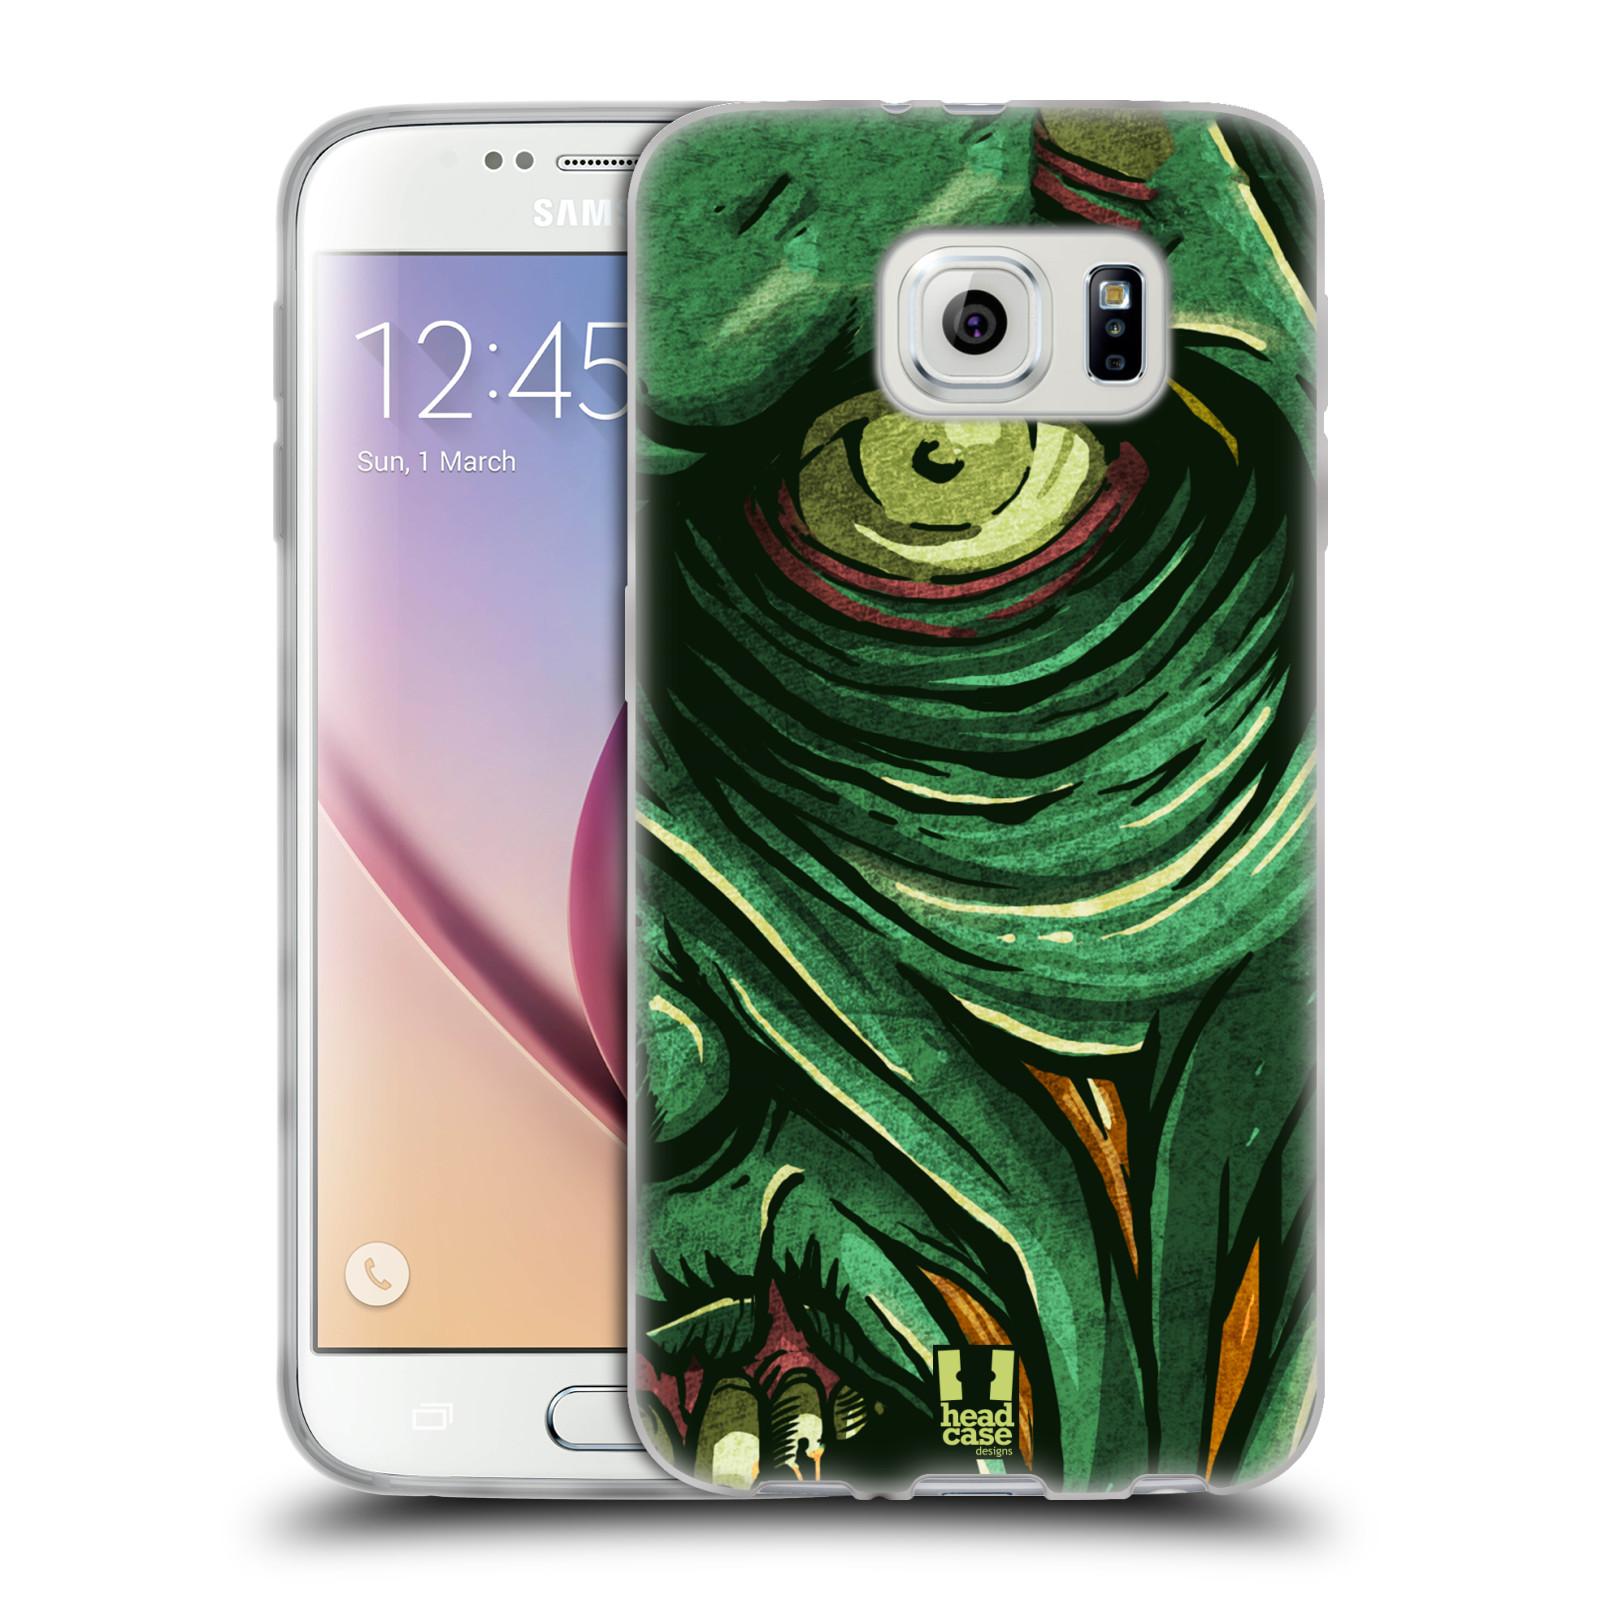 HEAD CASE DESIGNS ZOMBIES SOFT GEL CASE FOR SAMSUNG PHONES 1